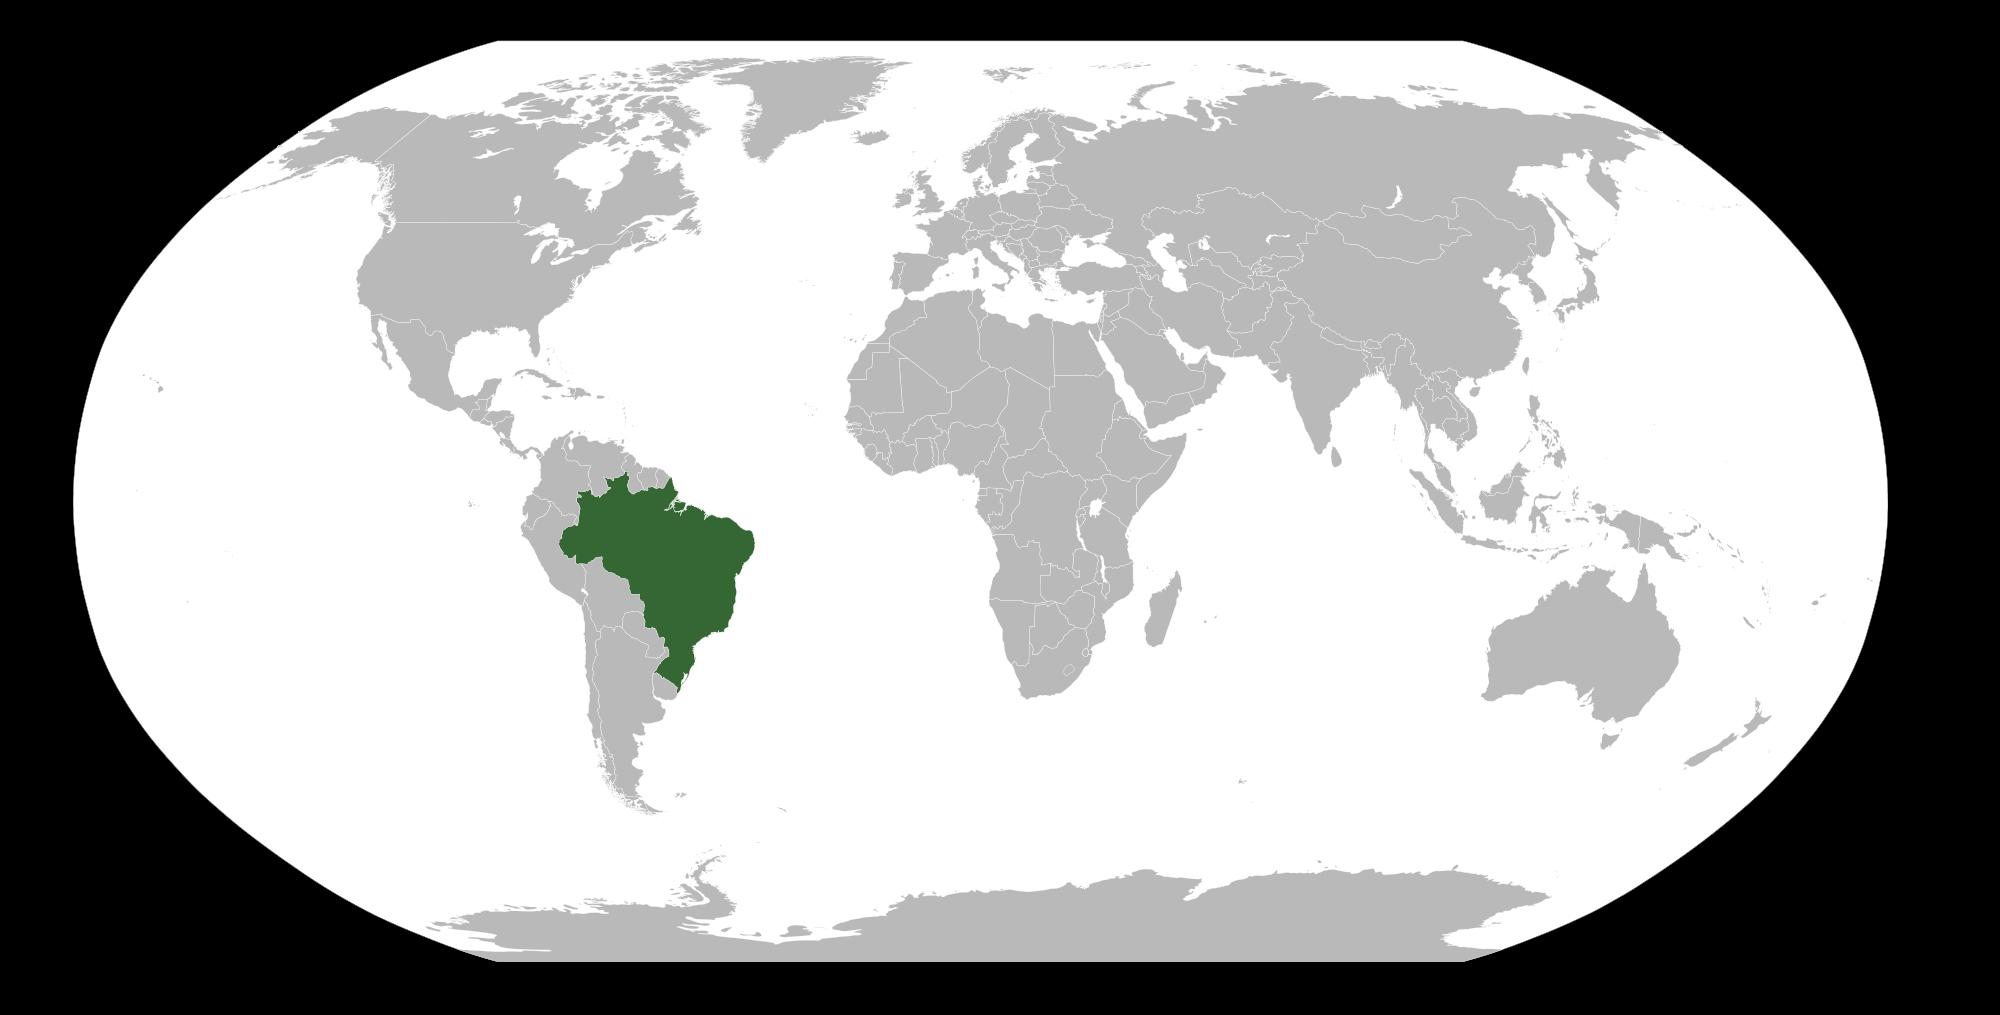 https://commons.wikimedia.org/wiki/File:Location_Brazil.svg